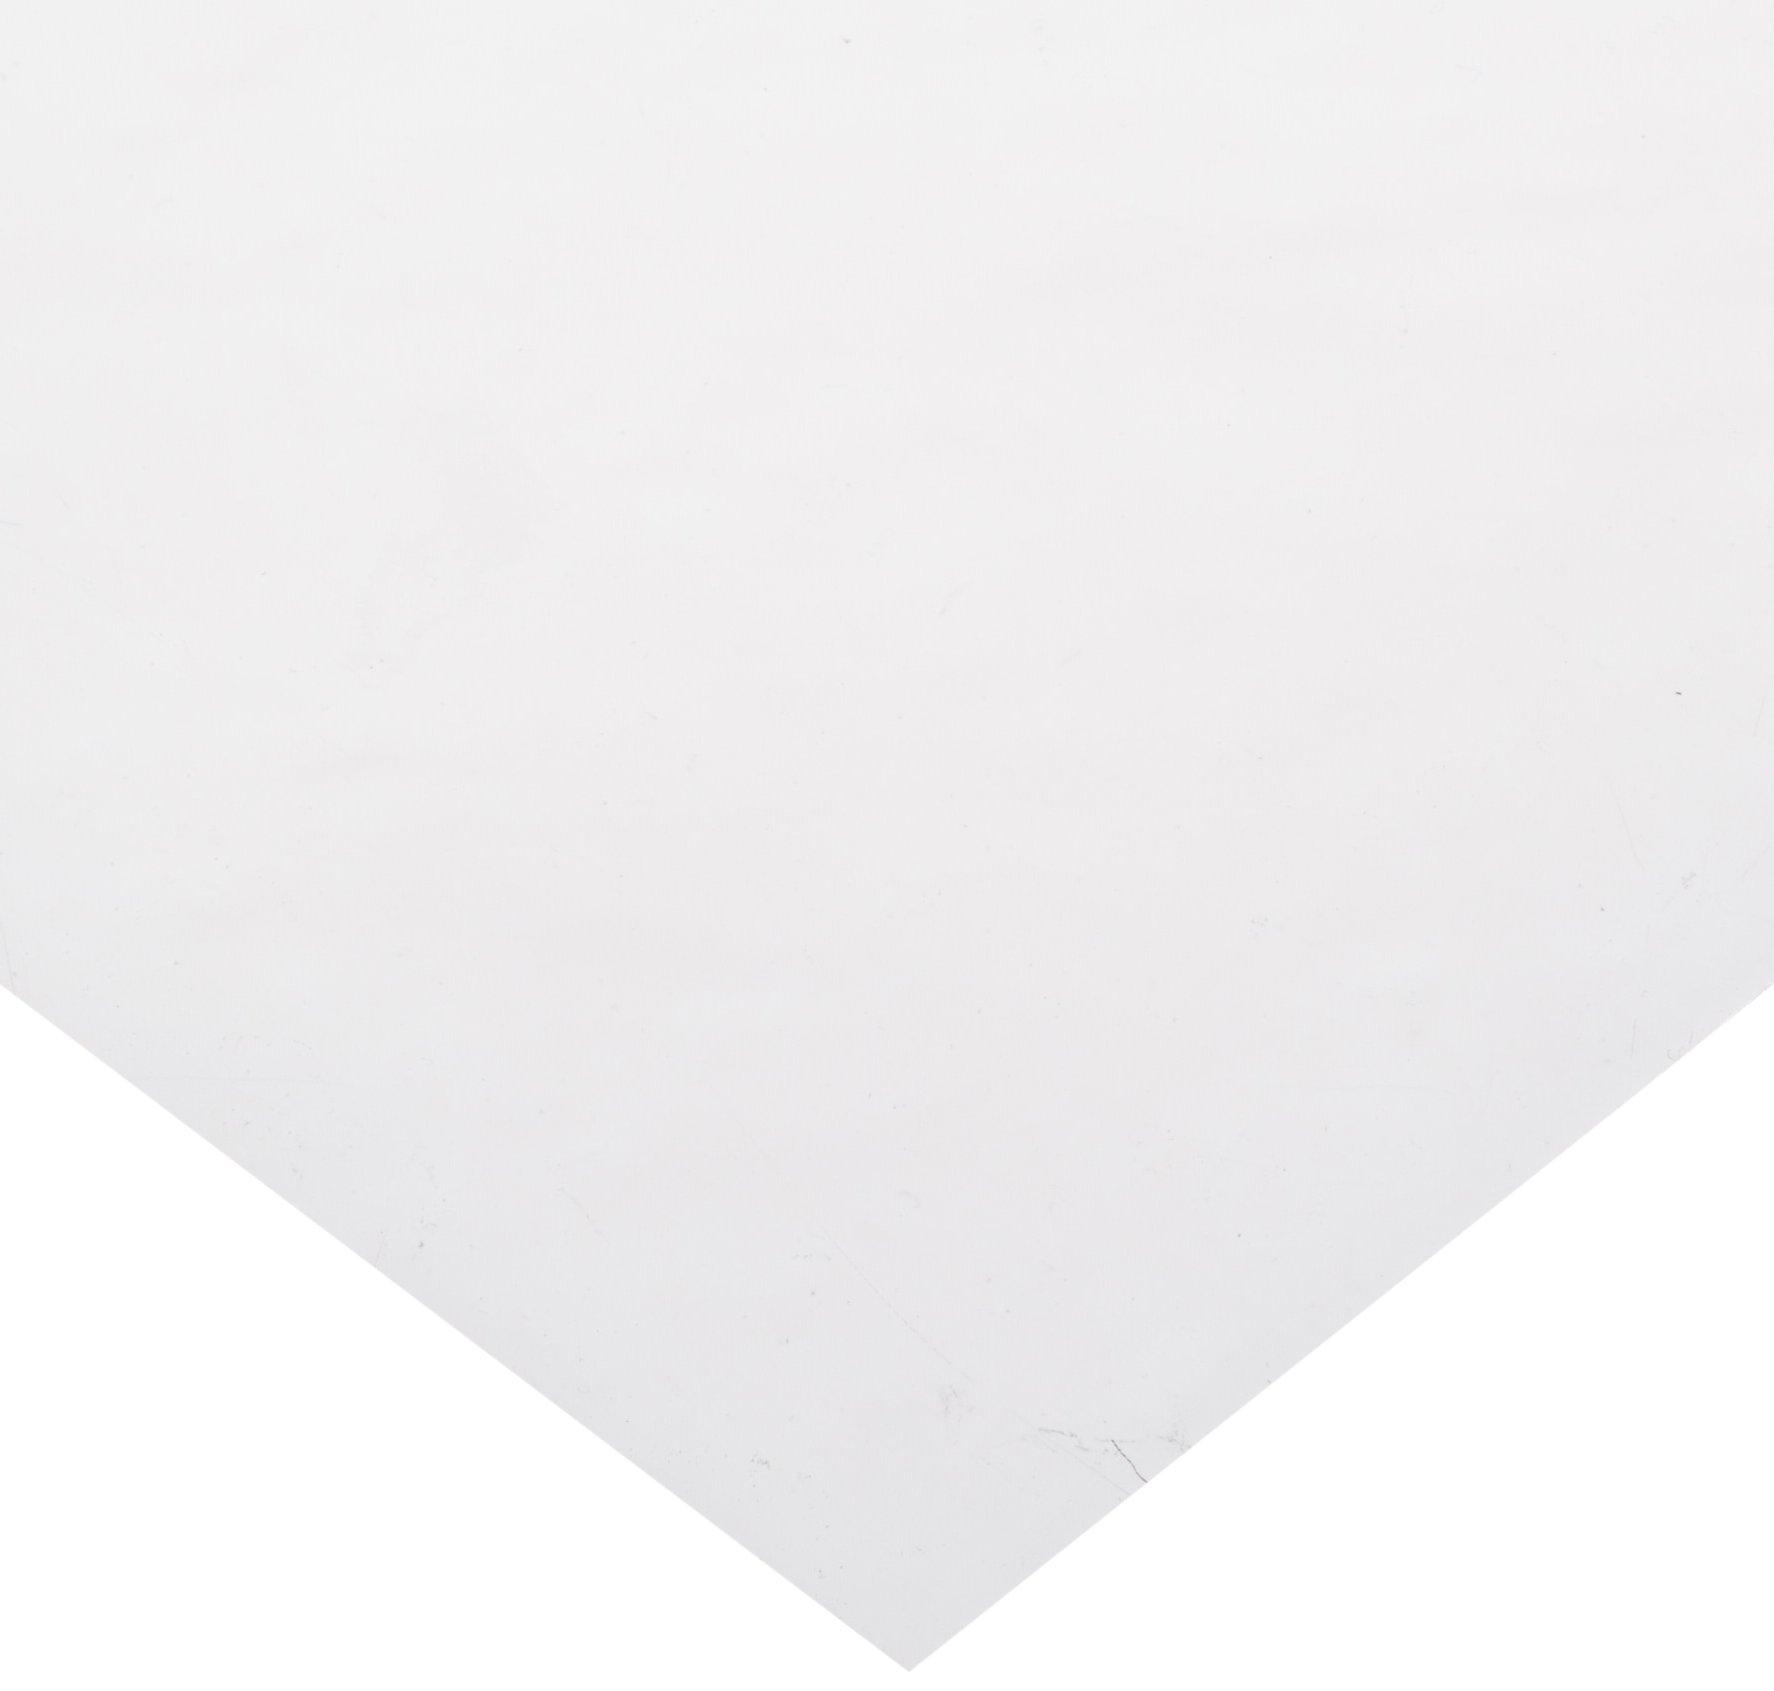 Boekel 230423 Nylon Mesh, 23cm L x 23cm W (Pack of 5)